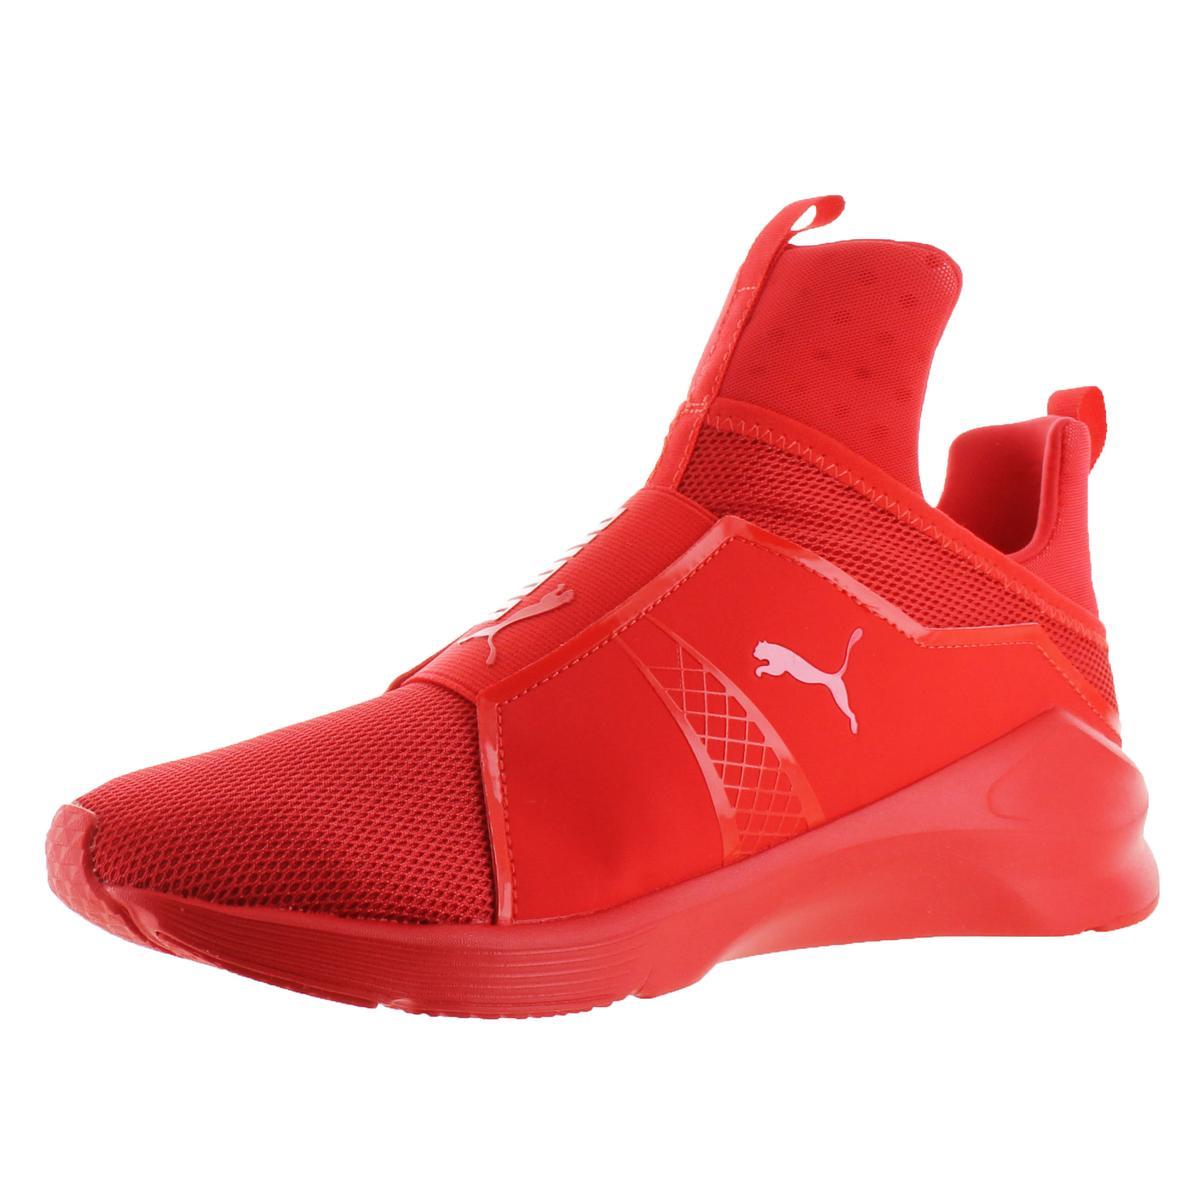 Zapatos De Entrenamiento Feroz Núcleo De Hombres Puma EdWgvxilB